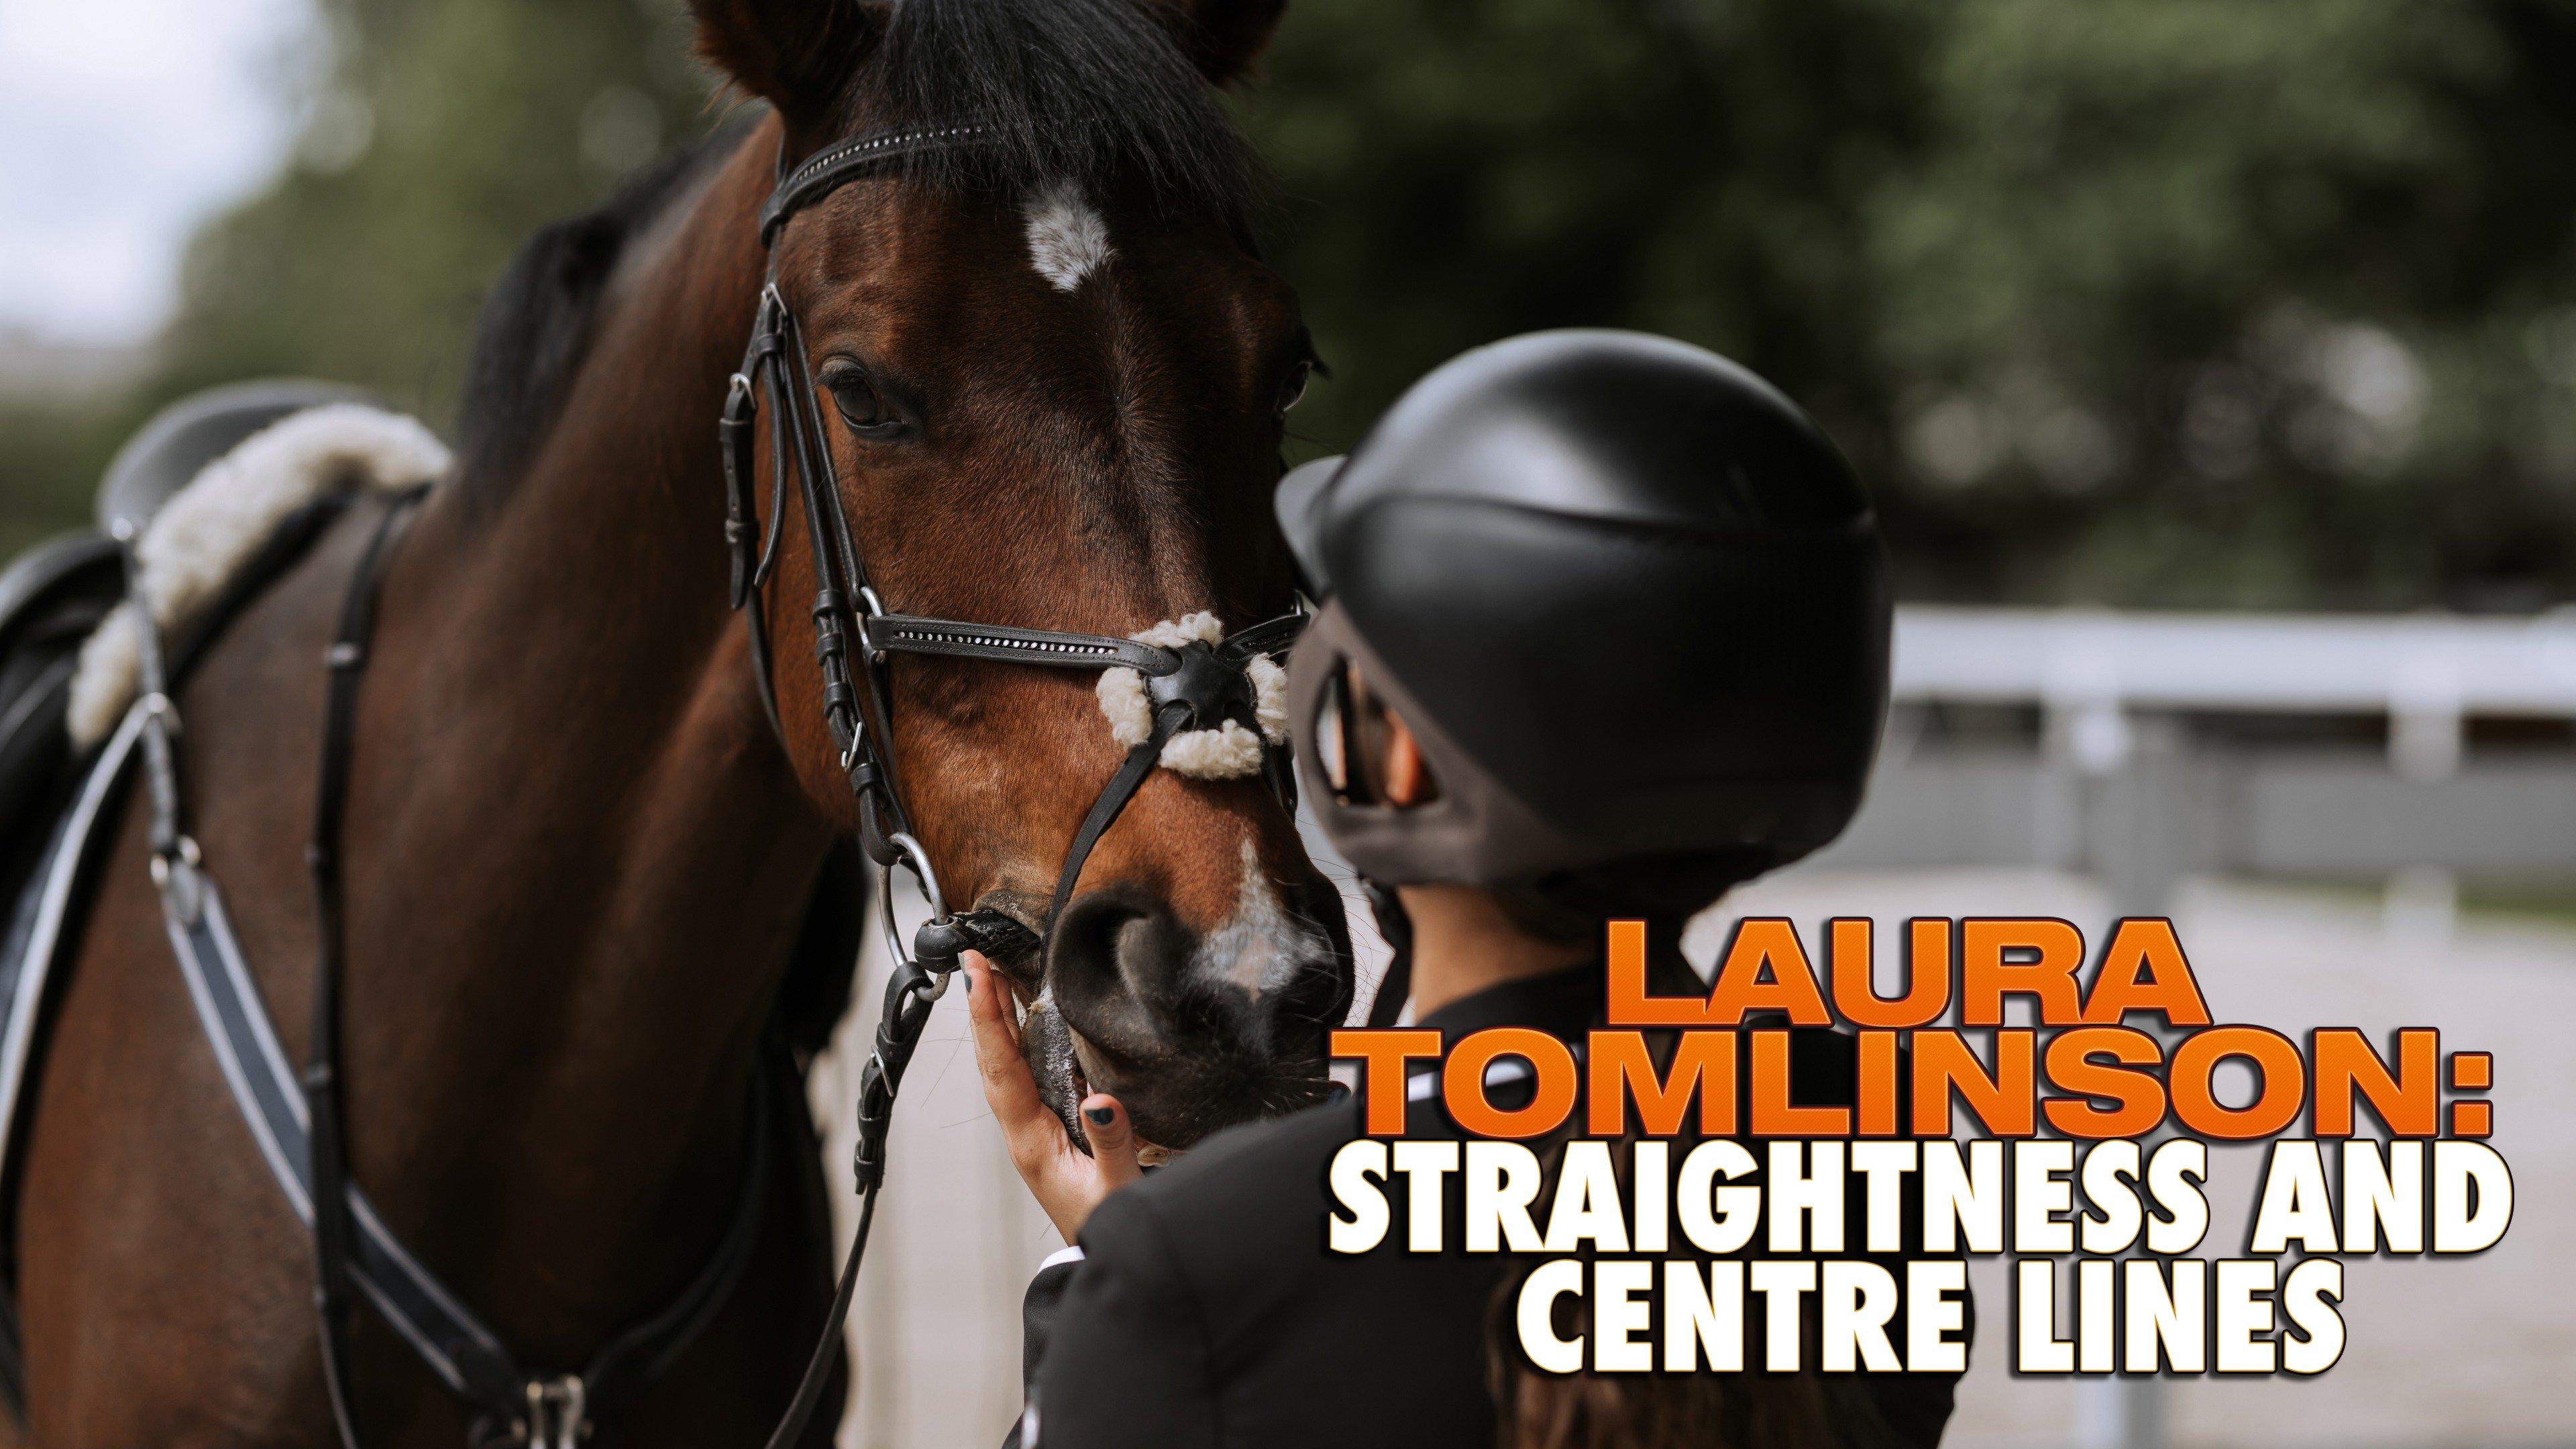 Laura Tomlinson: Straightness and Centre Lines